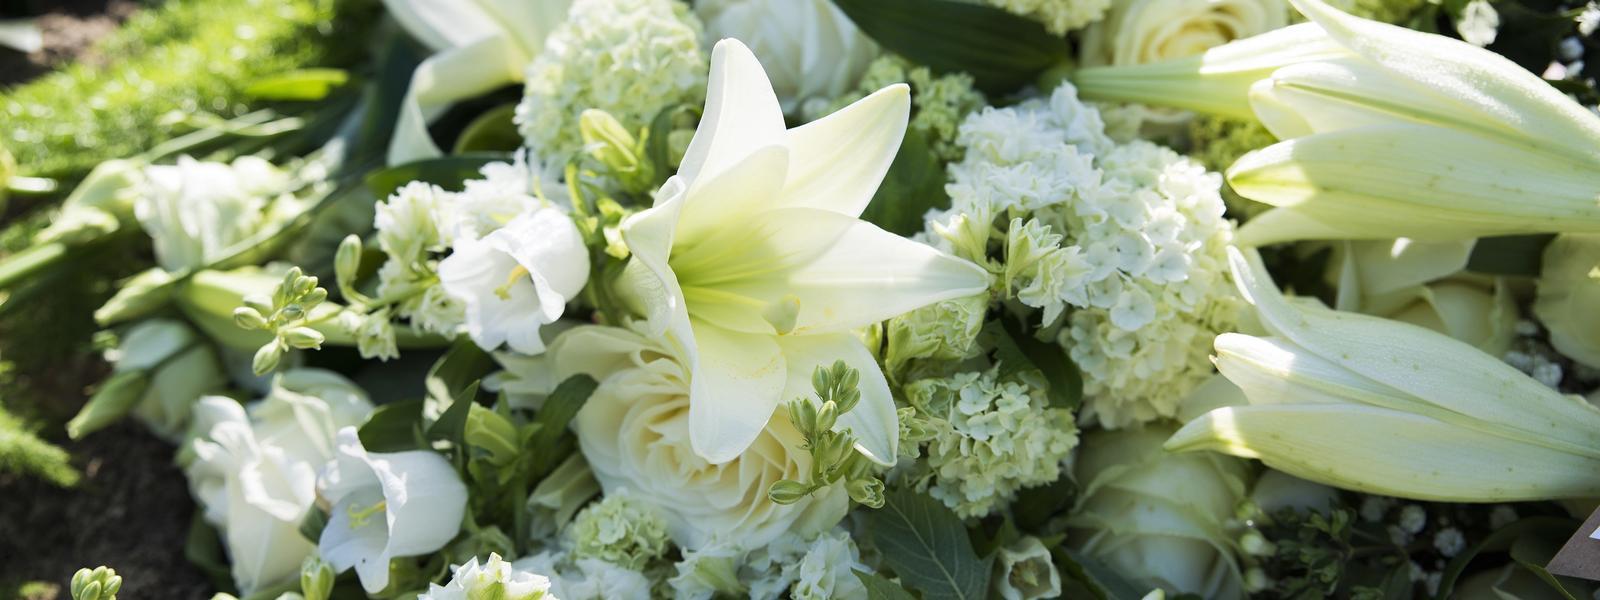 Funeral services Portsmouth Havant